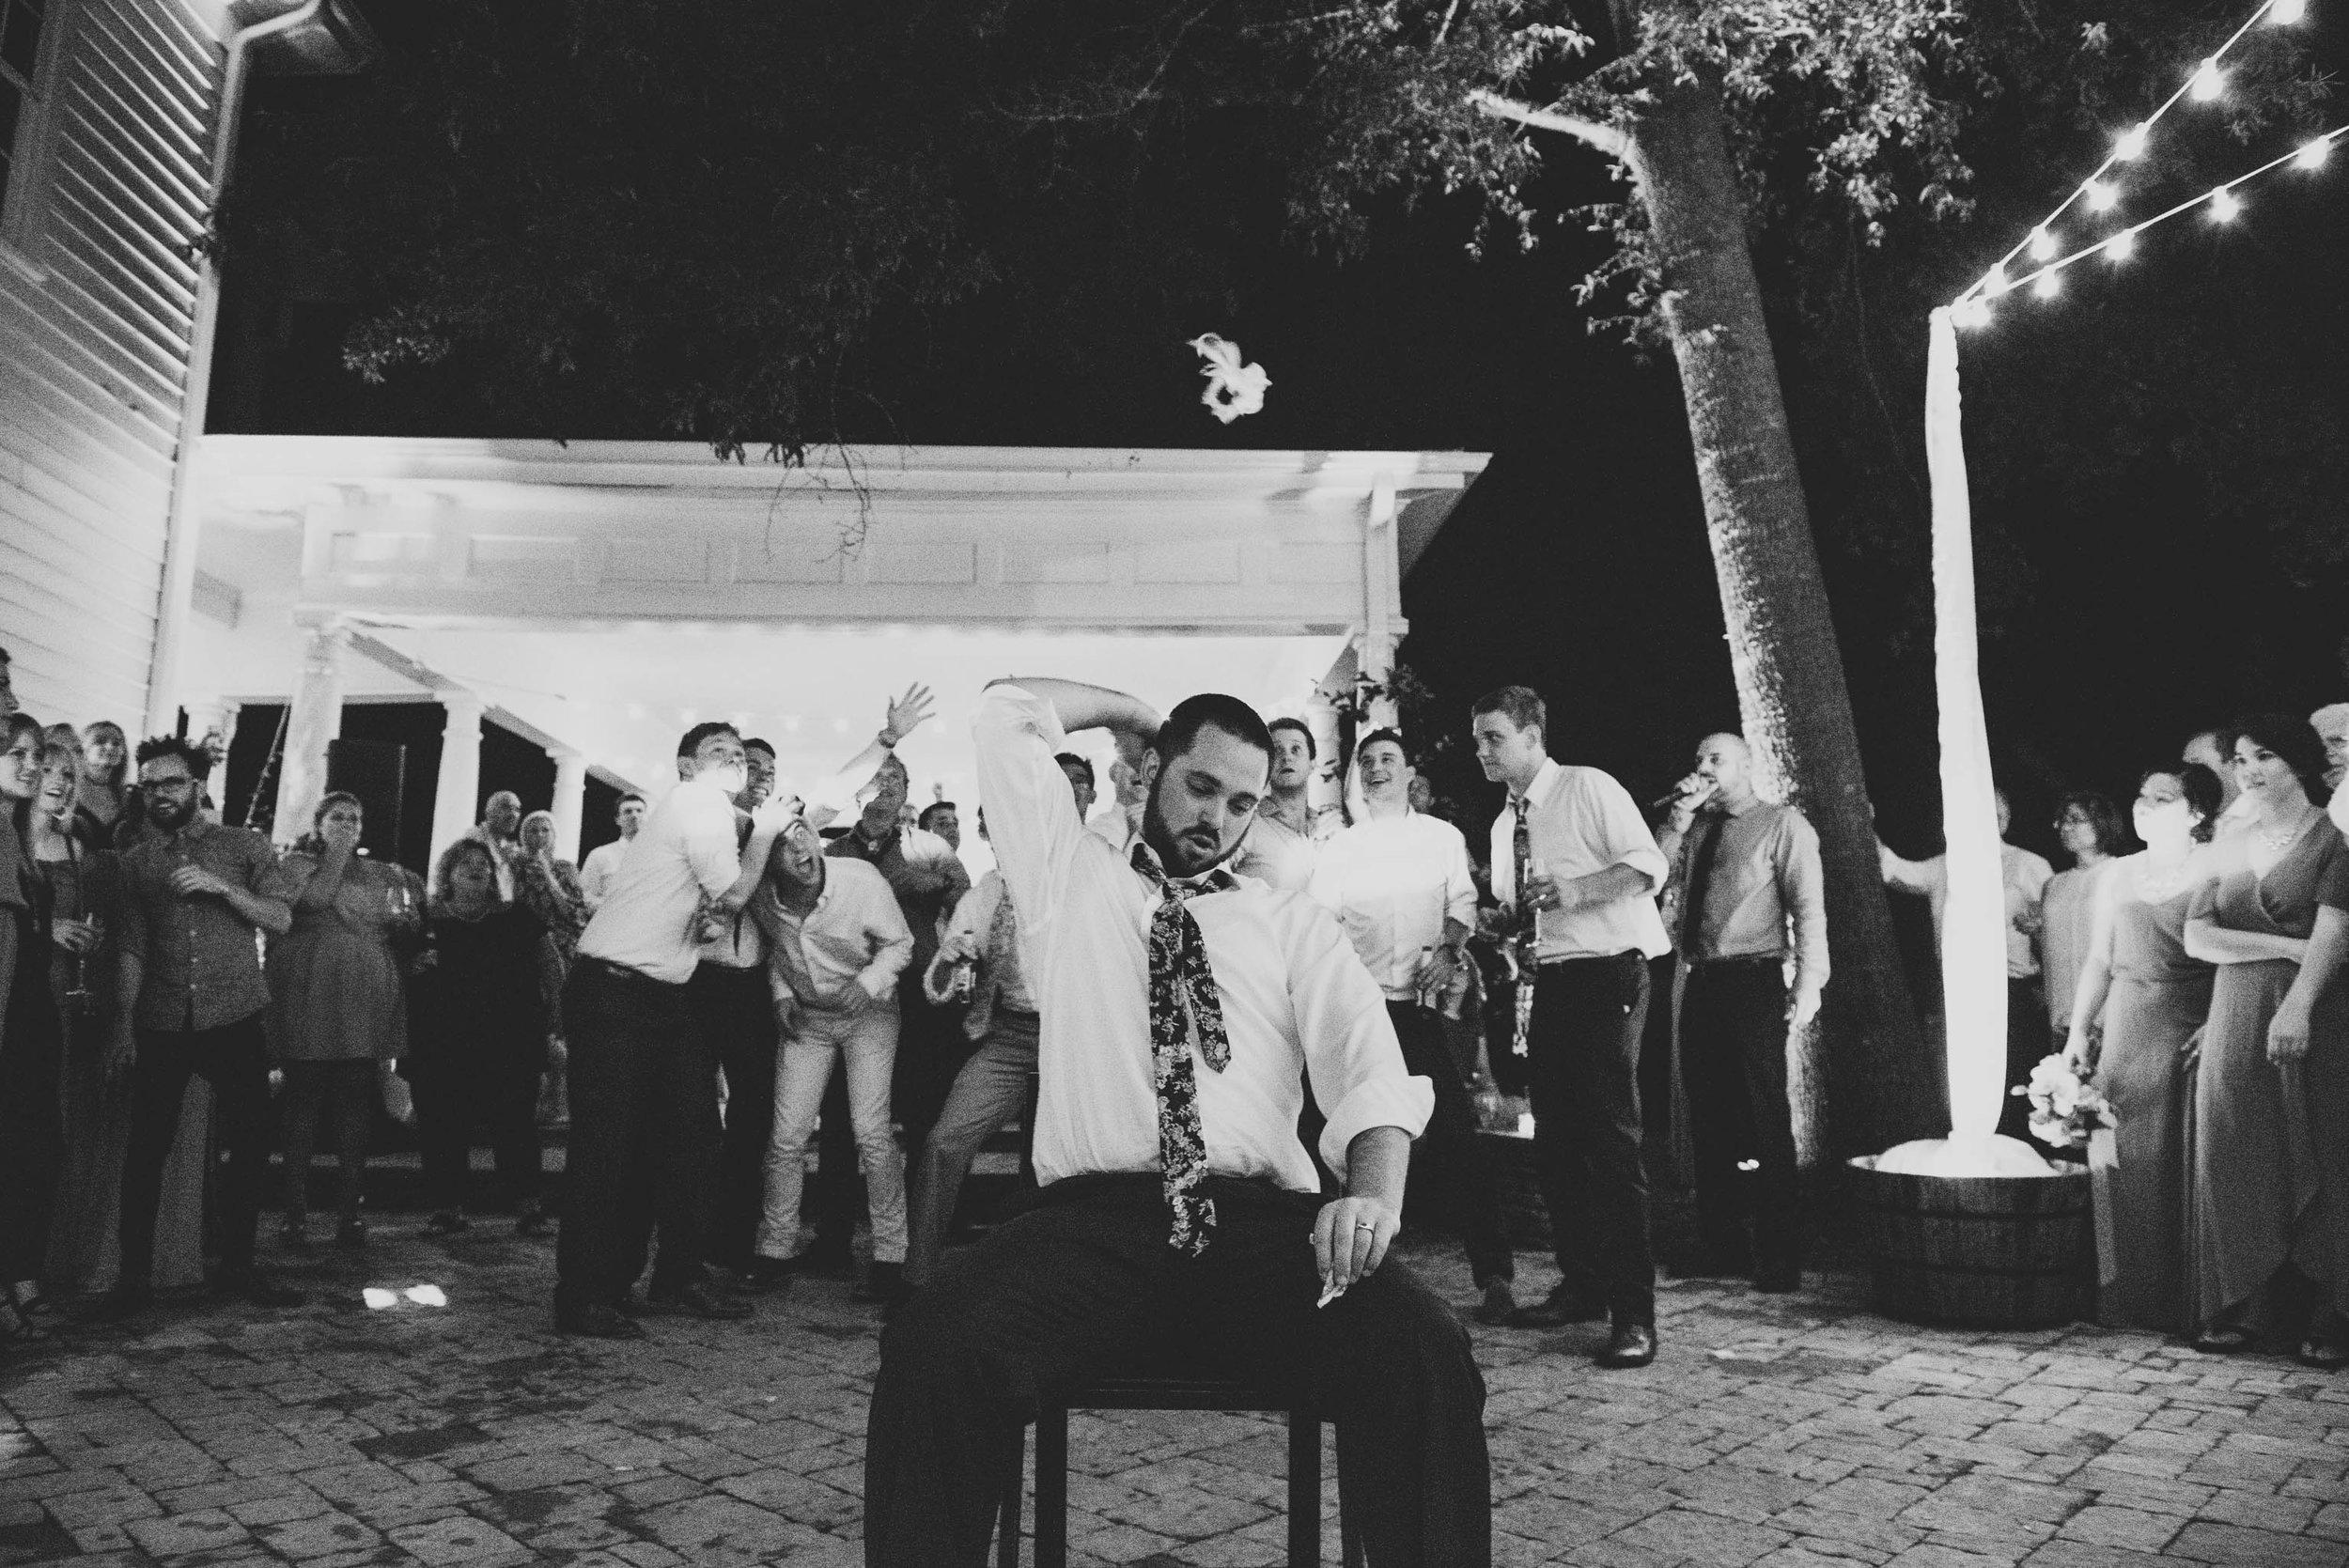 mims-house-wedding-groom-tosses-garter-photo.jpg